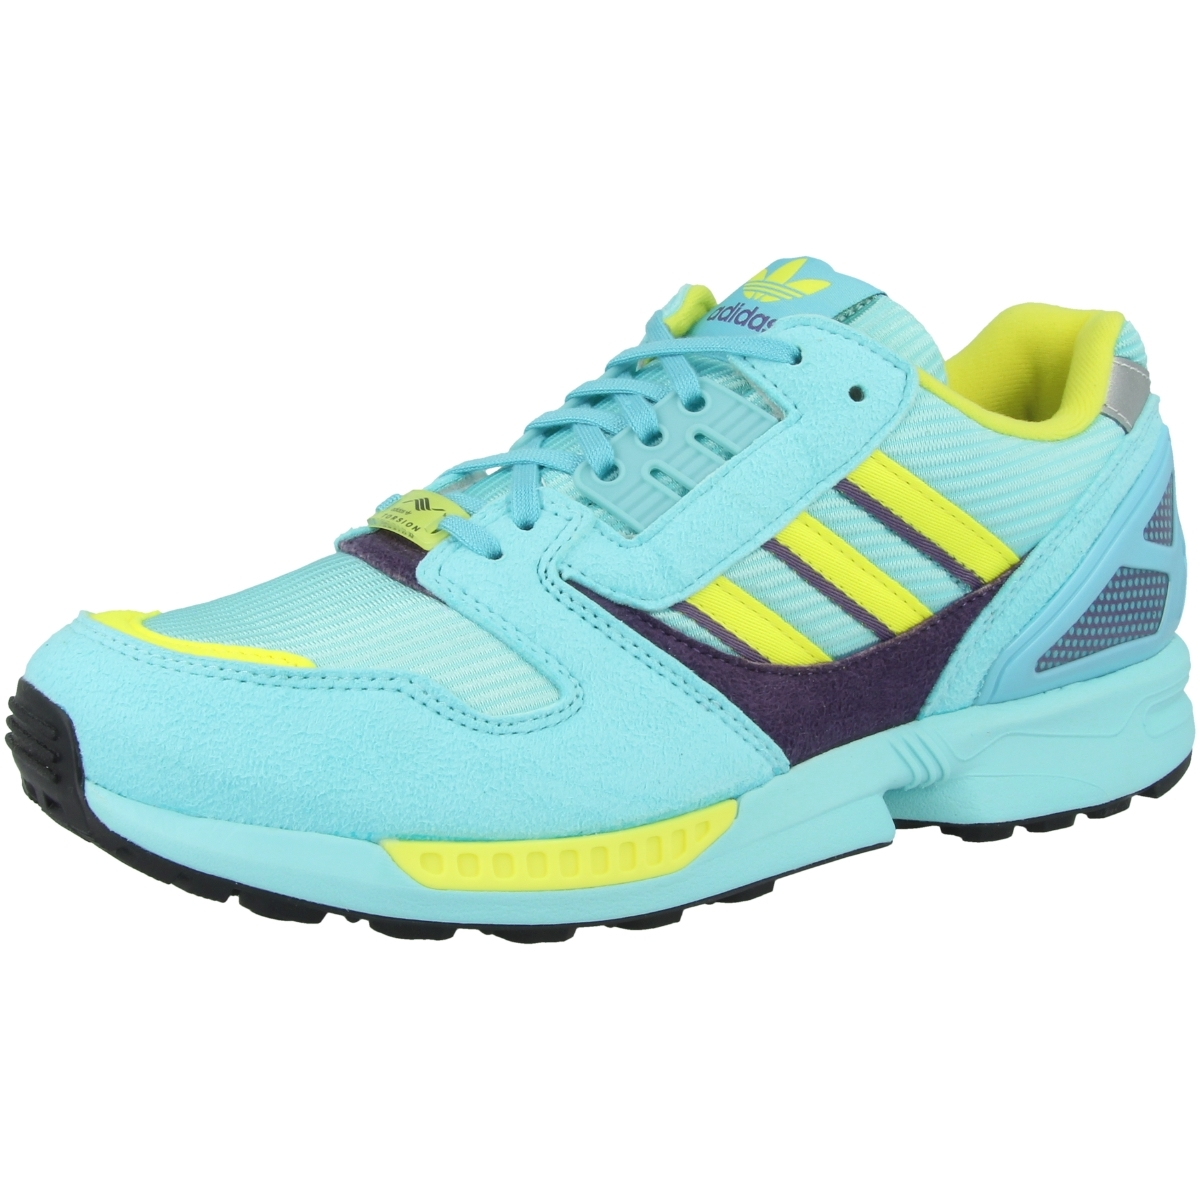 Adidas ZX 8000 Schuhe Originals Freizeit Sneaker Turnschuhe clear aqua EG8784